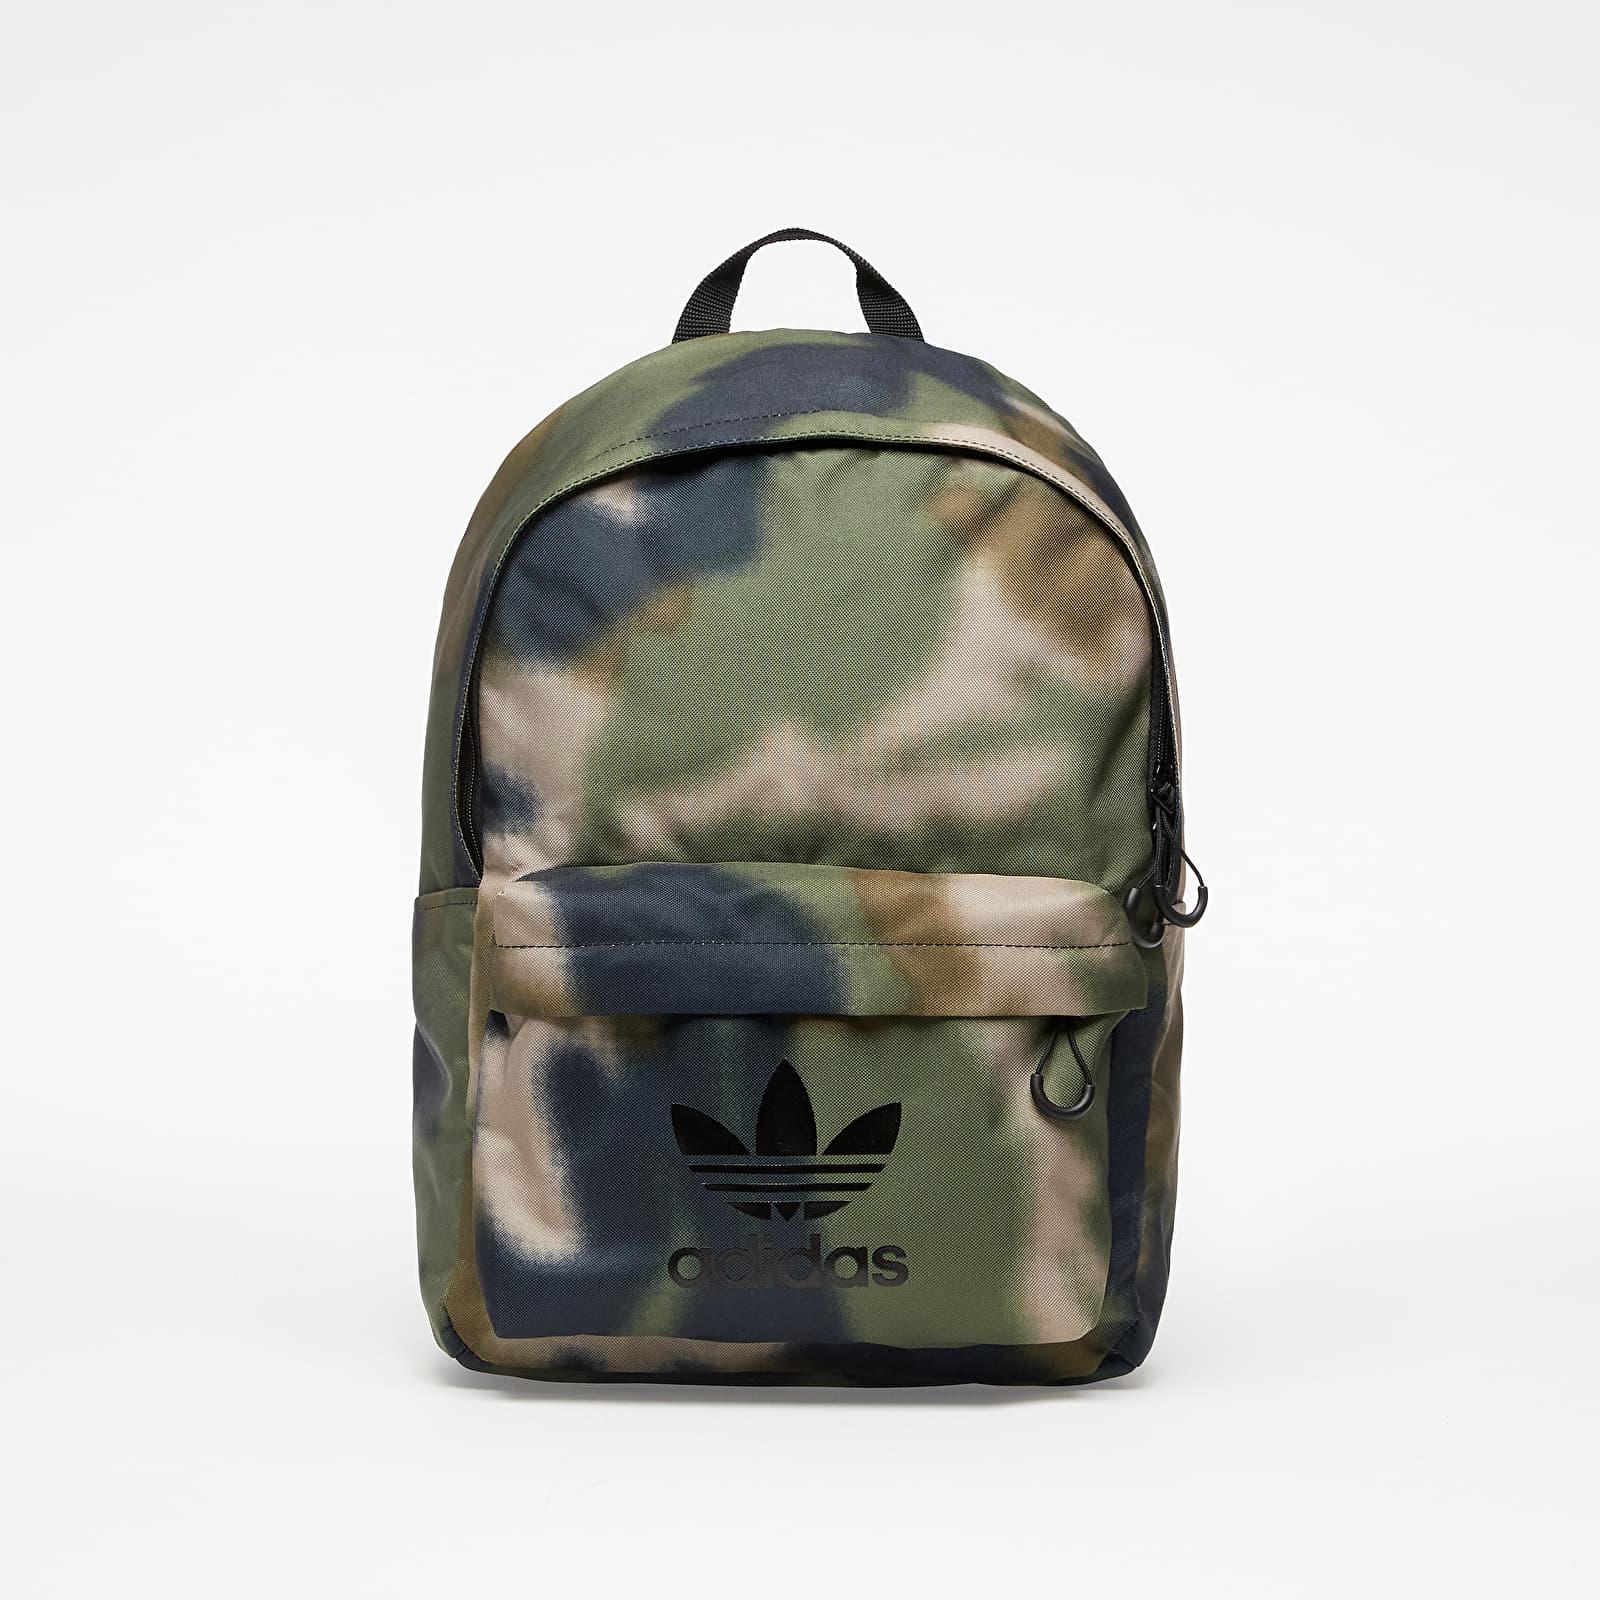 adidas Camo Classic Backpack Hemp/ Wild Pine/ Black 24,5 litra